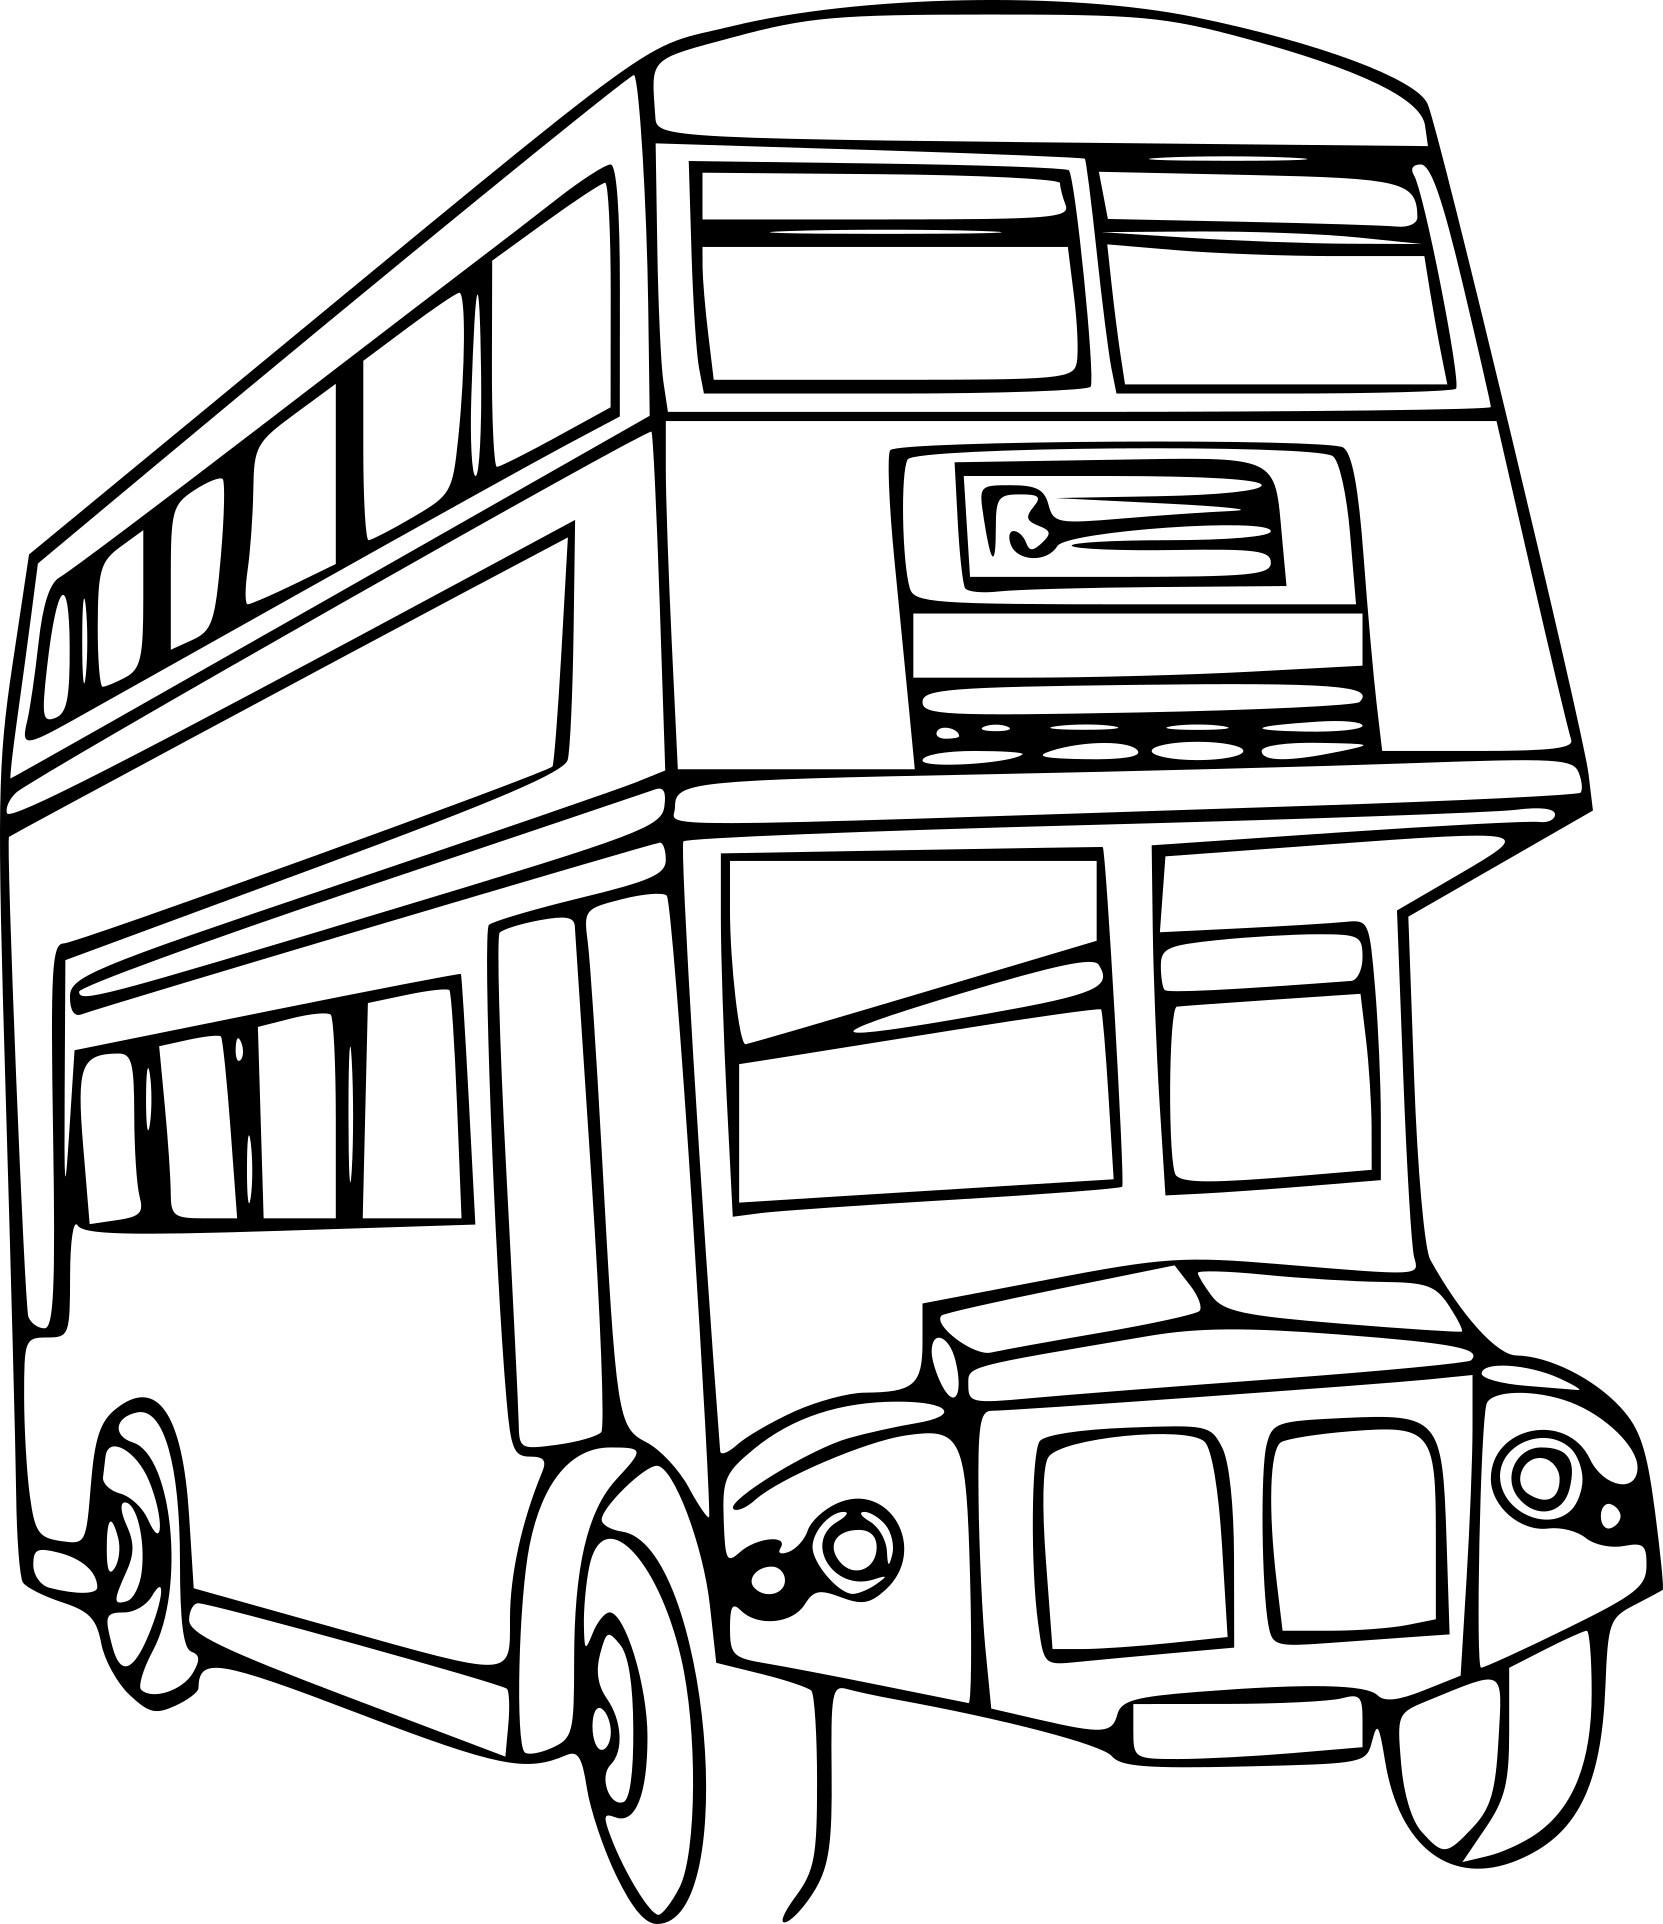 1663x1924 Coloriage Minibus Superbe Plan Coloriage Autobus Coloriage Roue